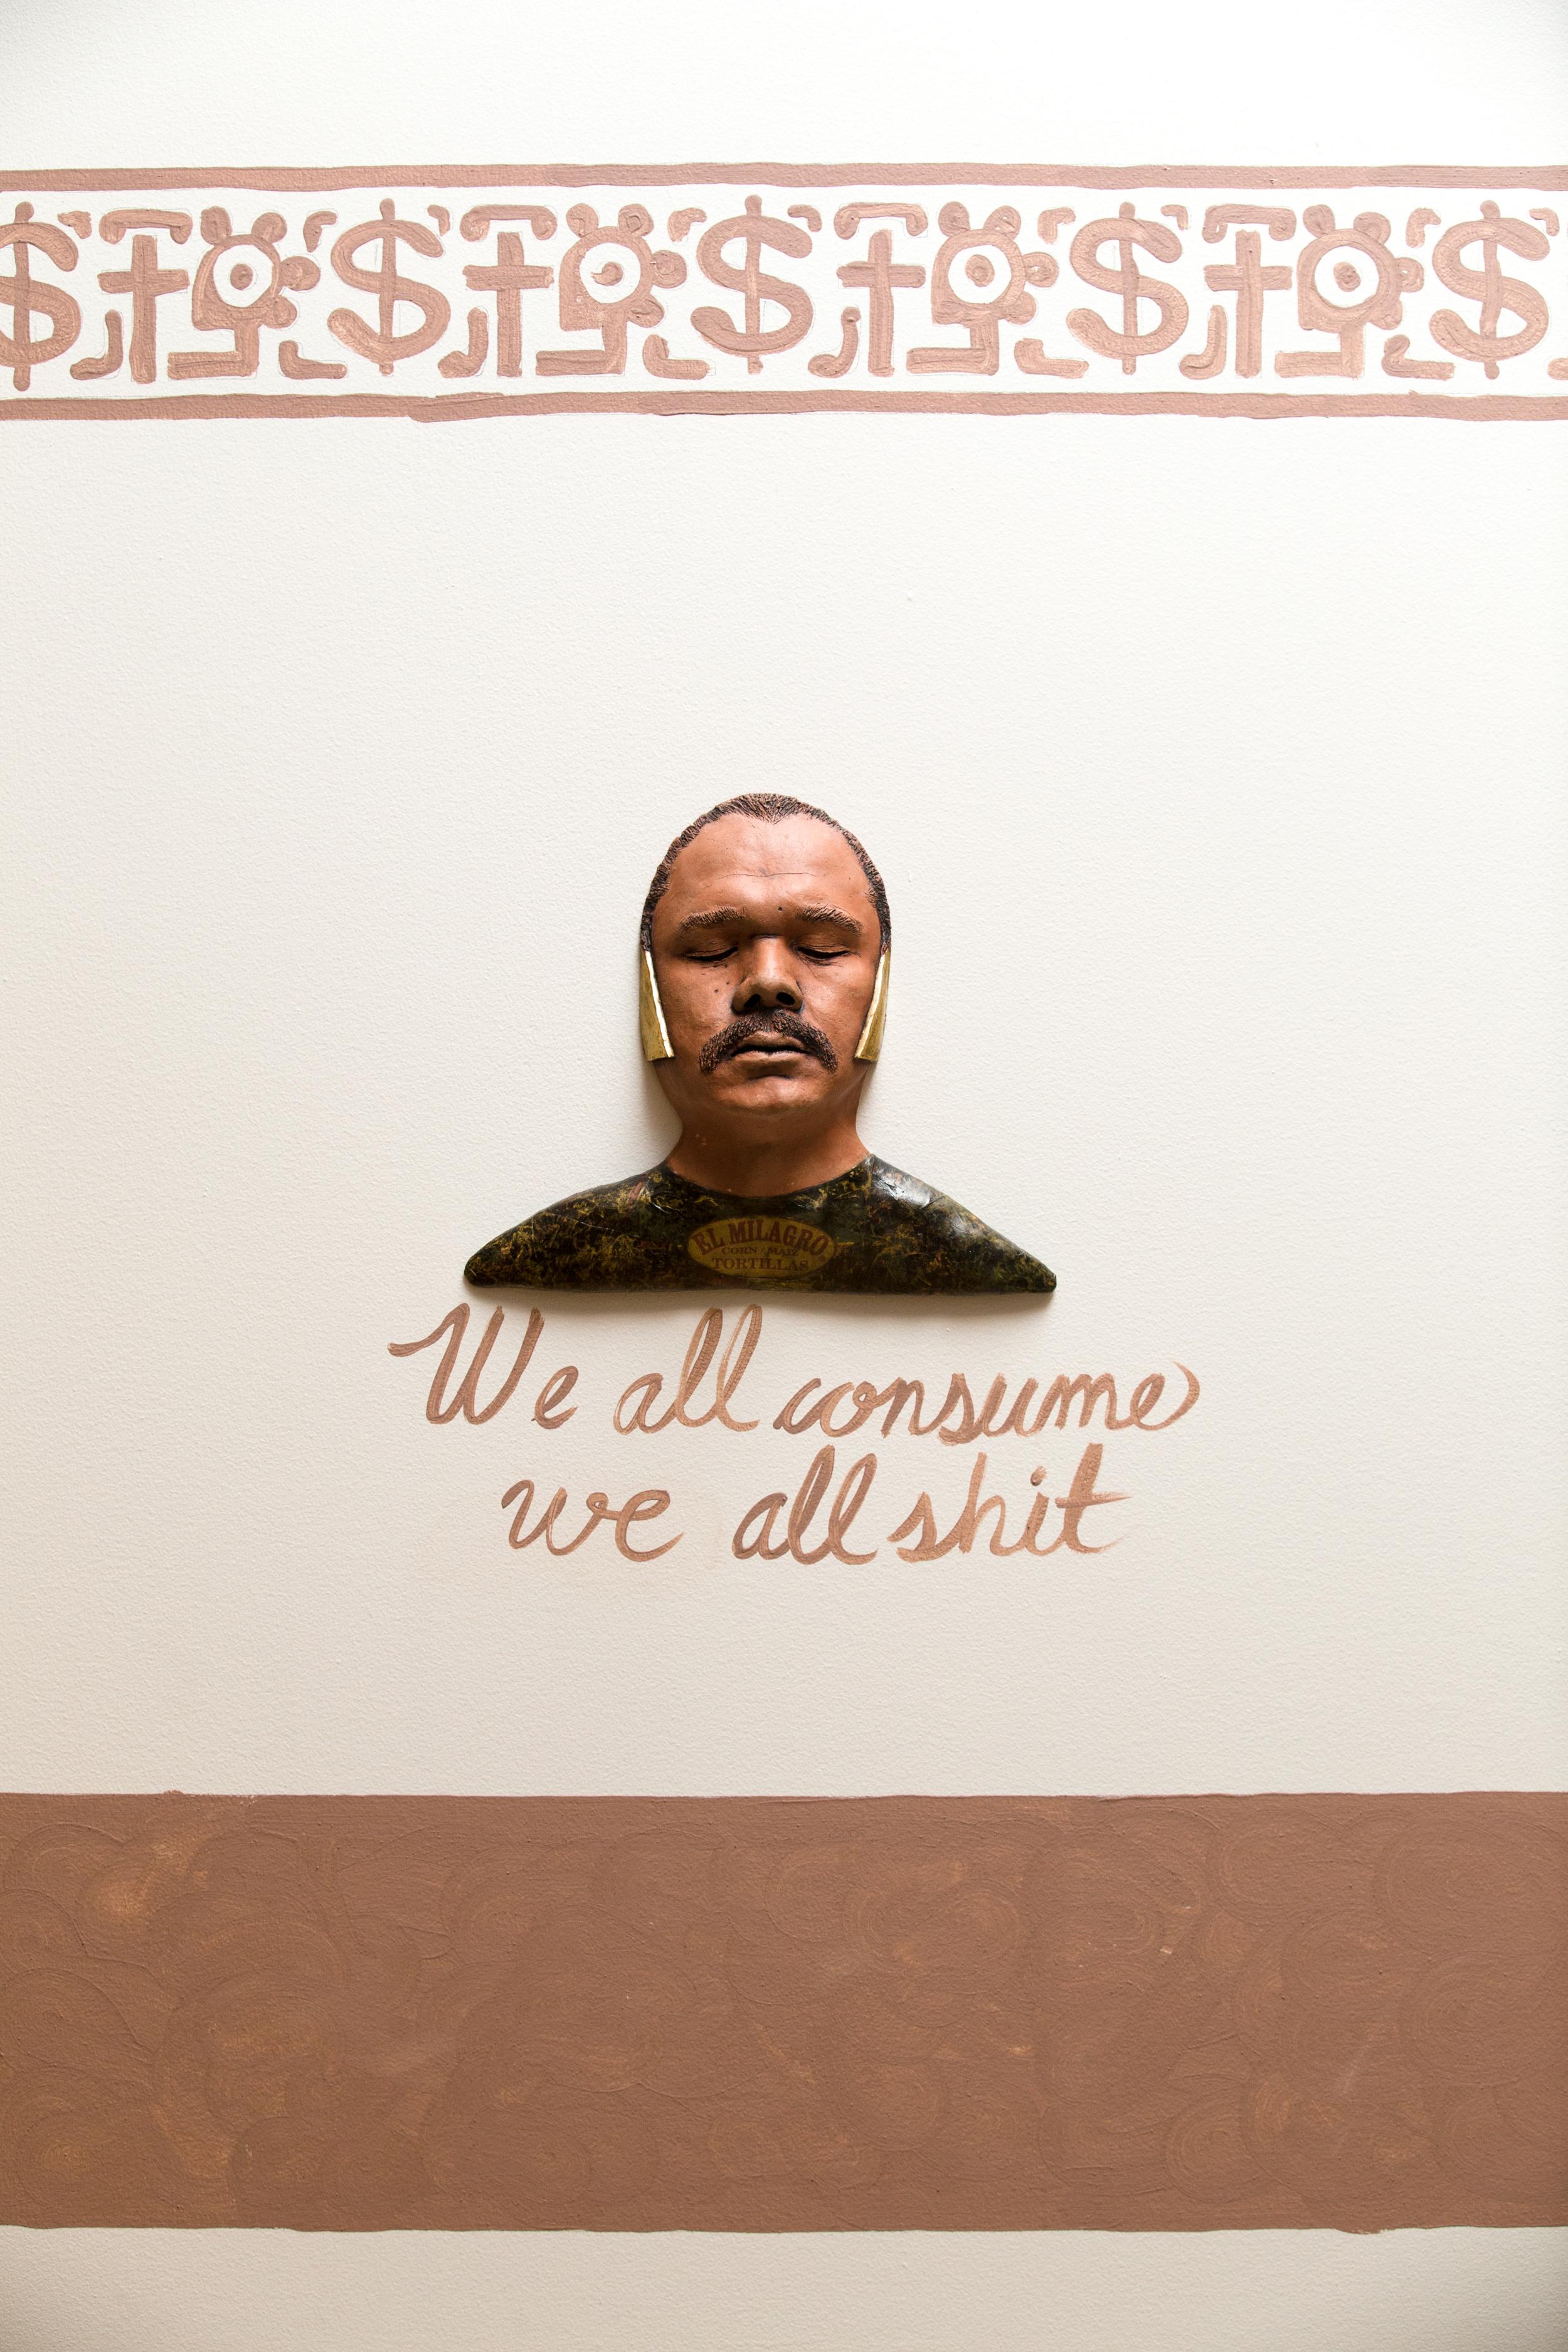 We All Consume, We All Shit/Todos consumimos, todos defecamos